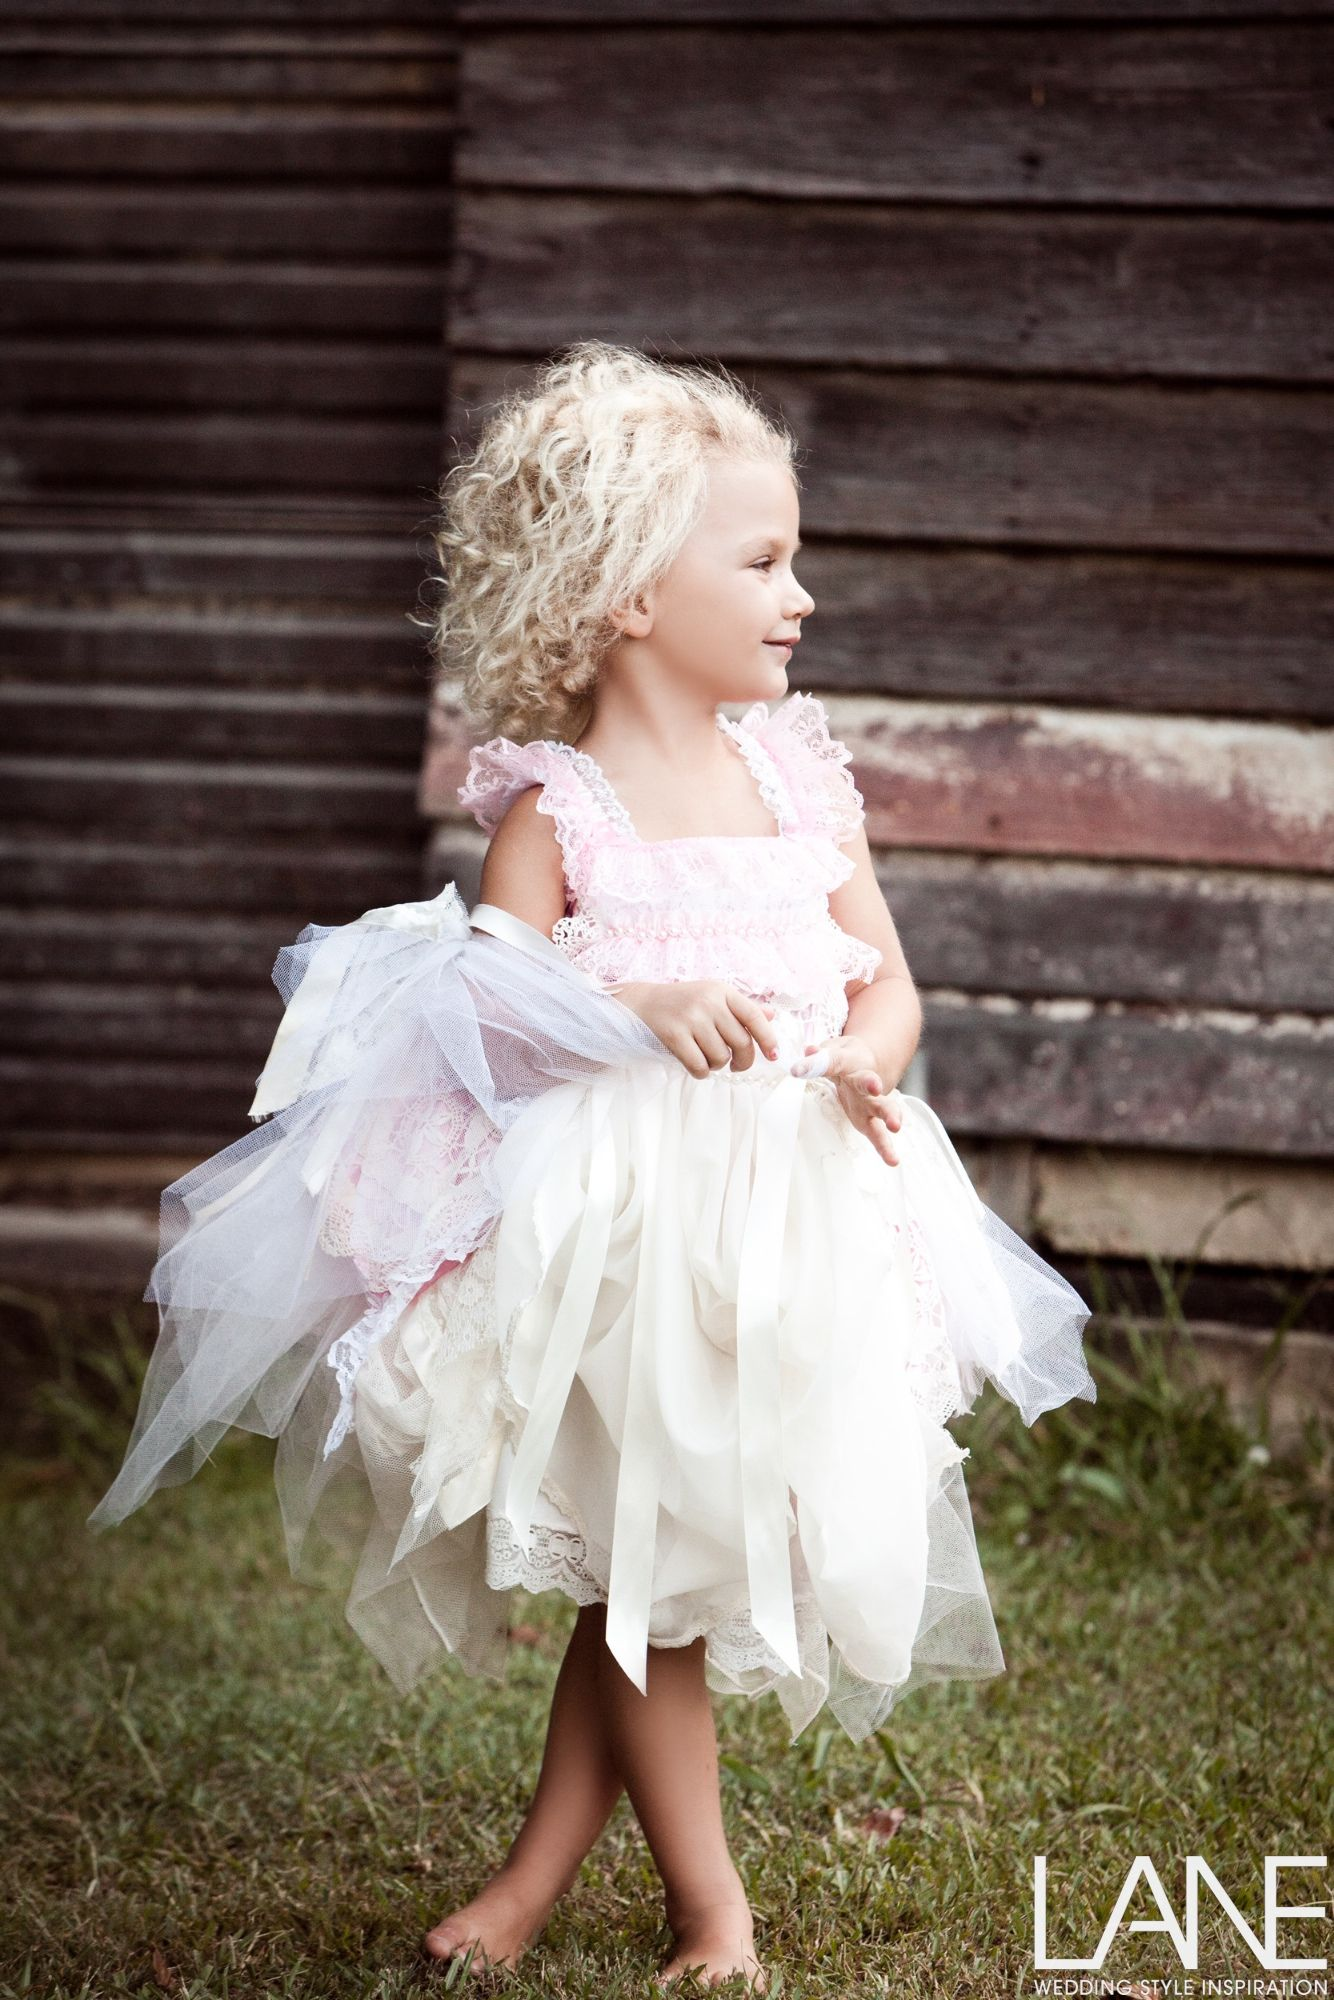 Flower girl dresses australia wedding pinterest dresses flower girl dresses australia izmirmasajfo Choice Image